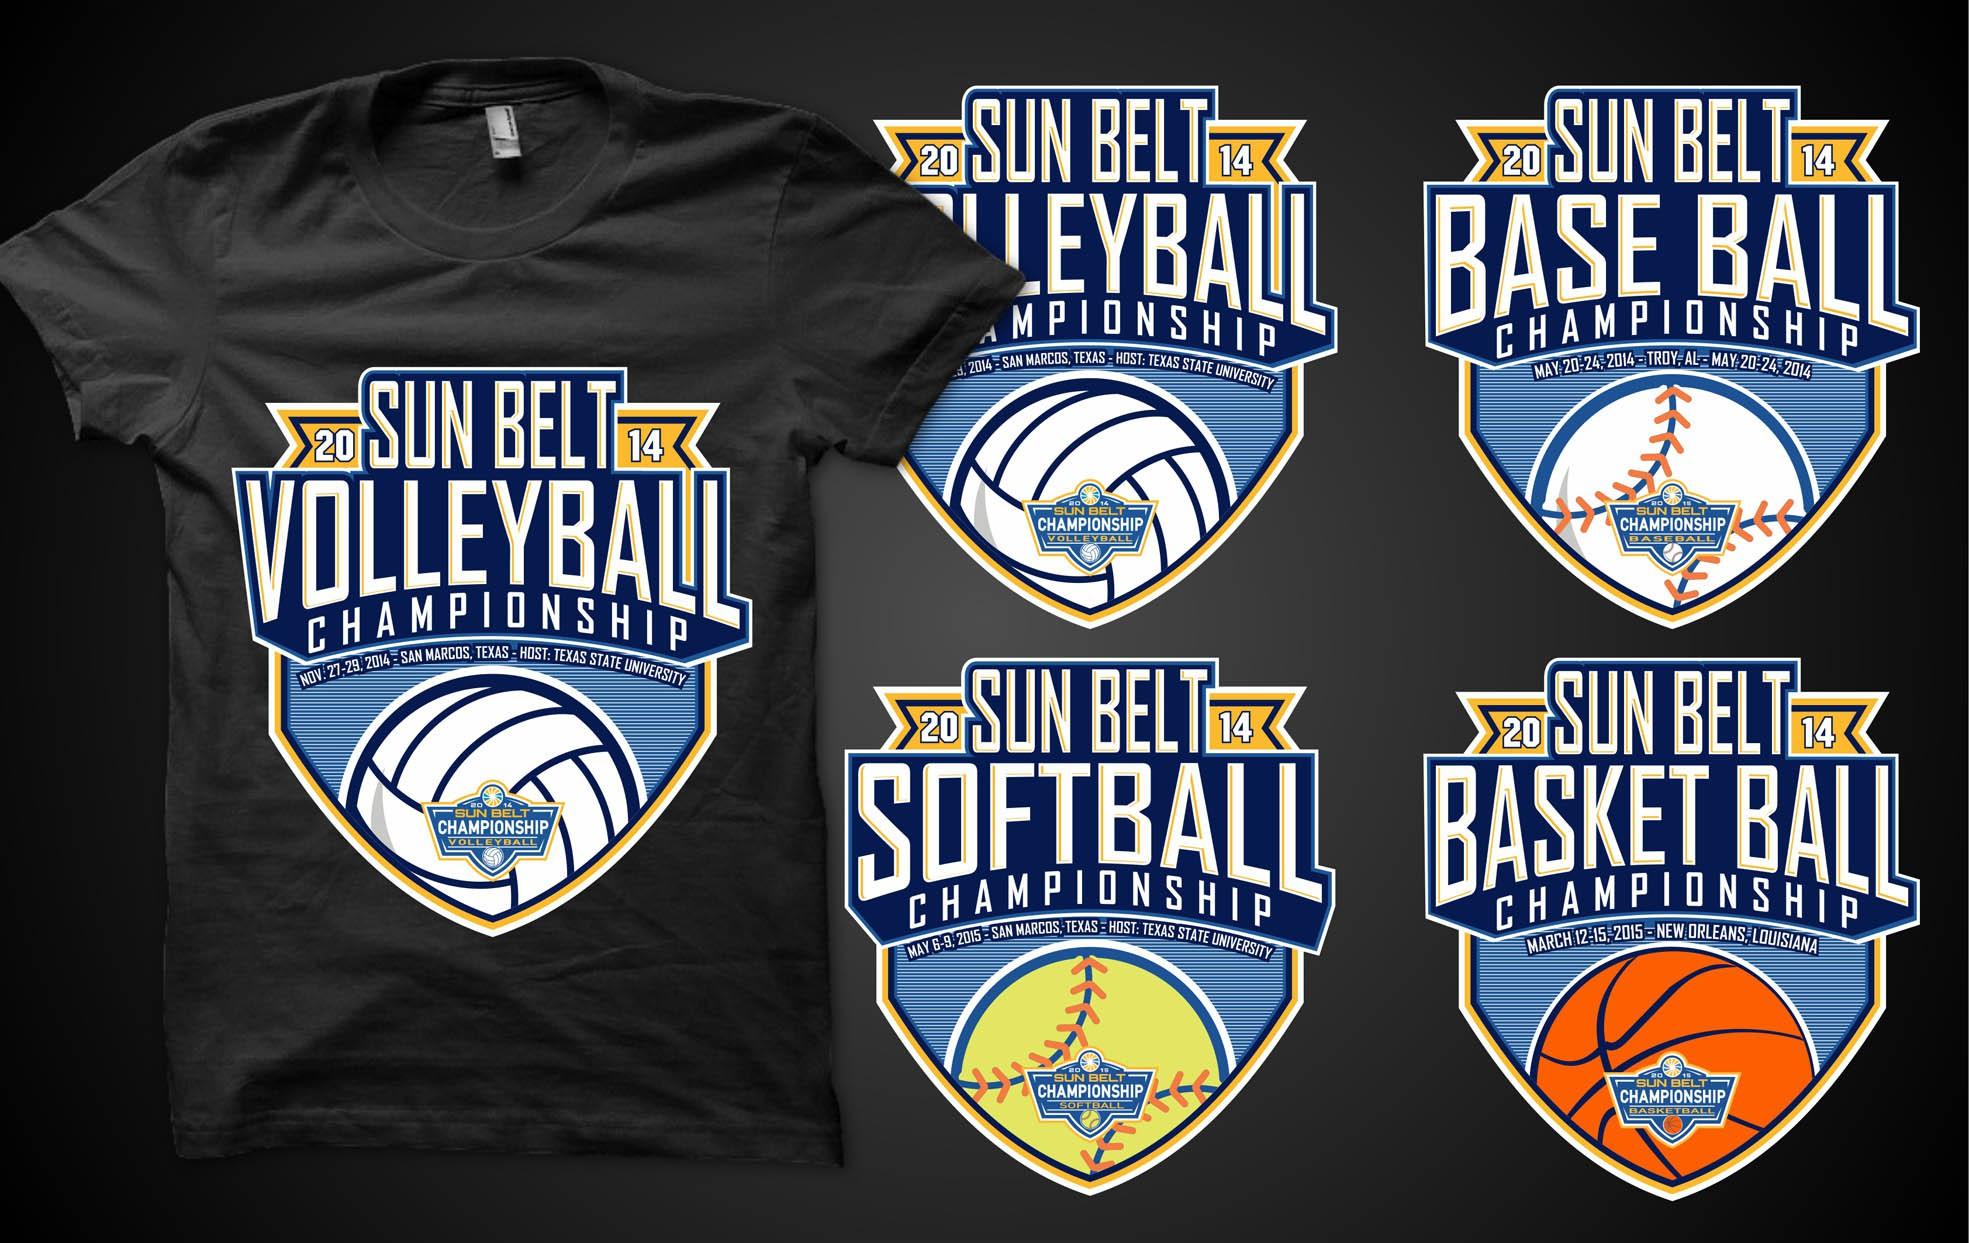 Sun Belt Championships T-shirt Design Contest